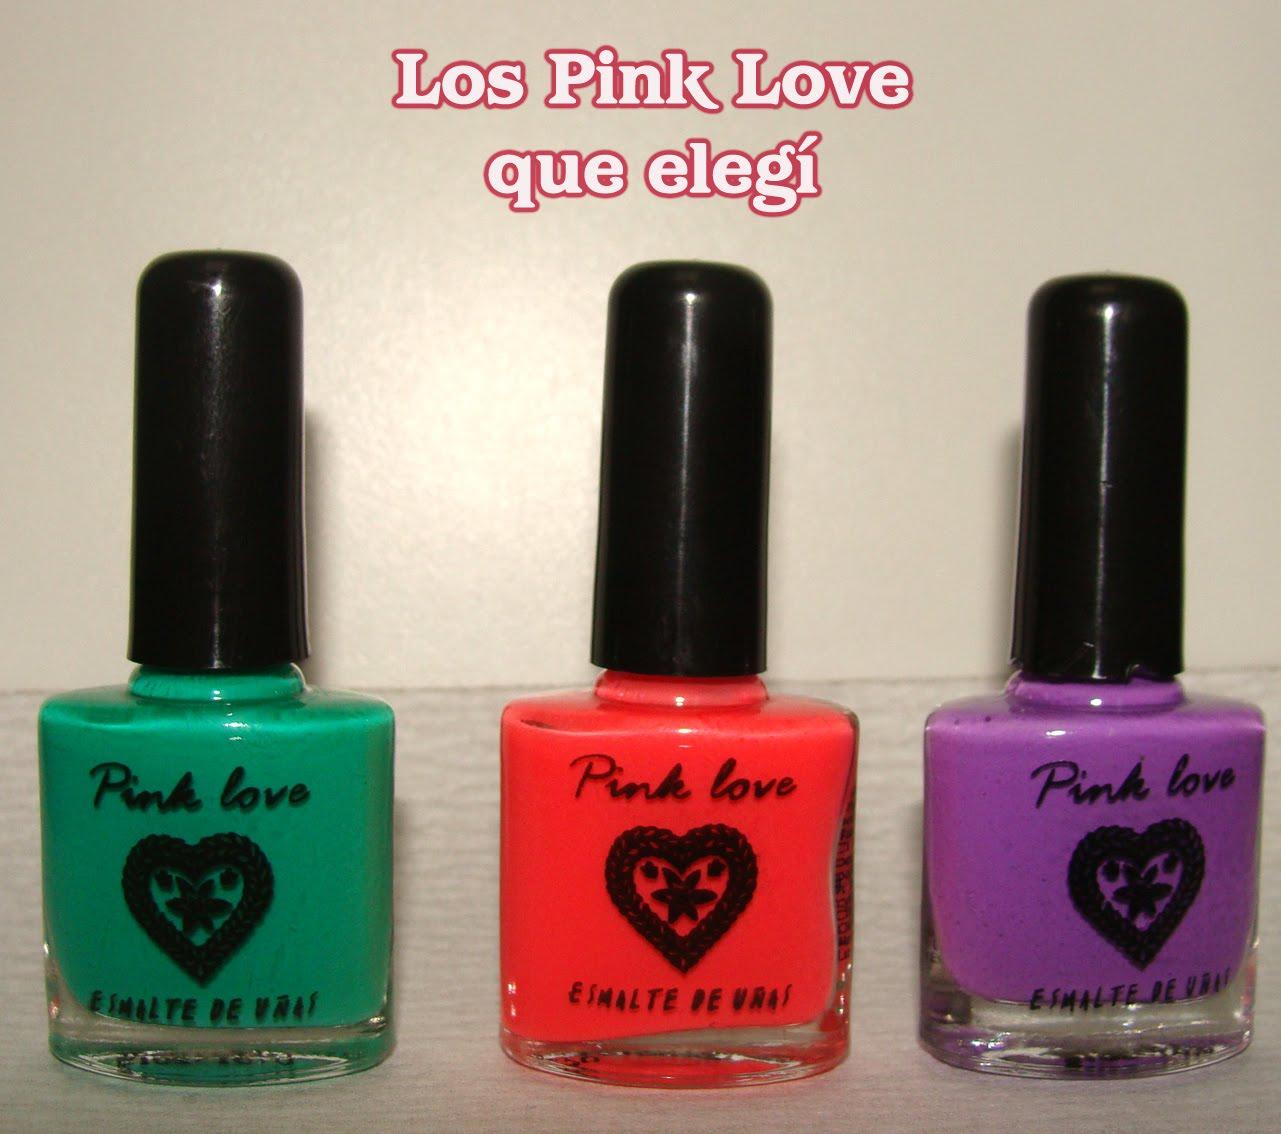 Esmaltes de Julie: Promo Pink Love !! yo la aproveché